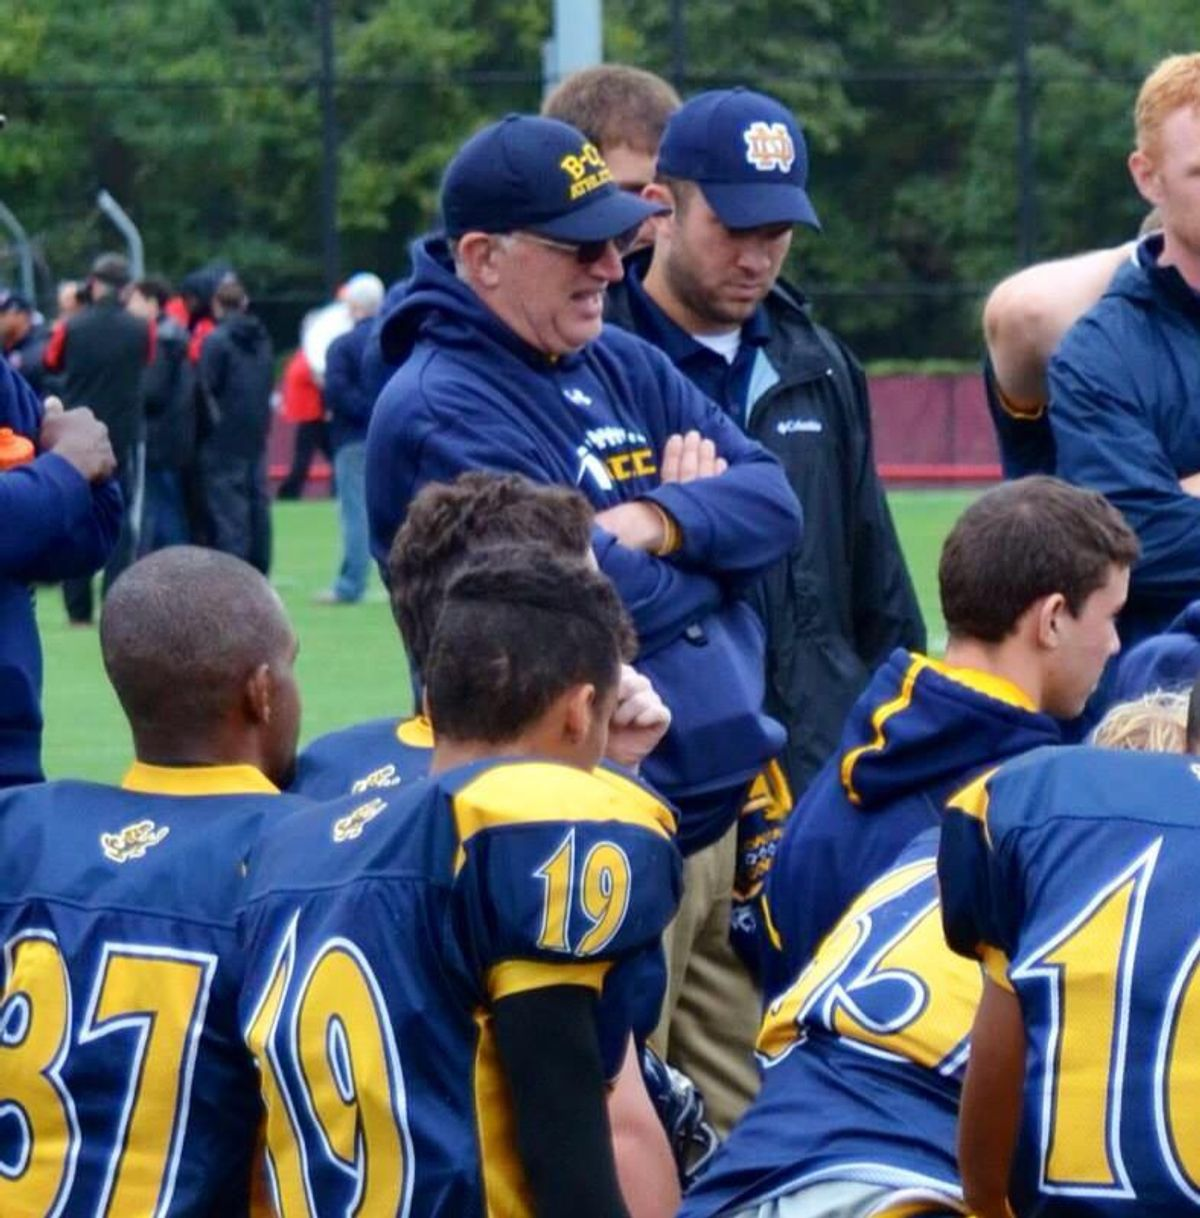 Remembering Coach Jeffrey Van Grack (1953-2014)